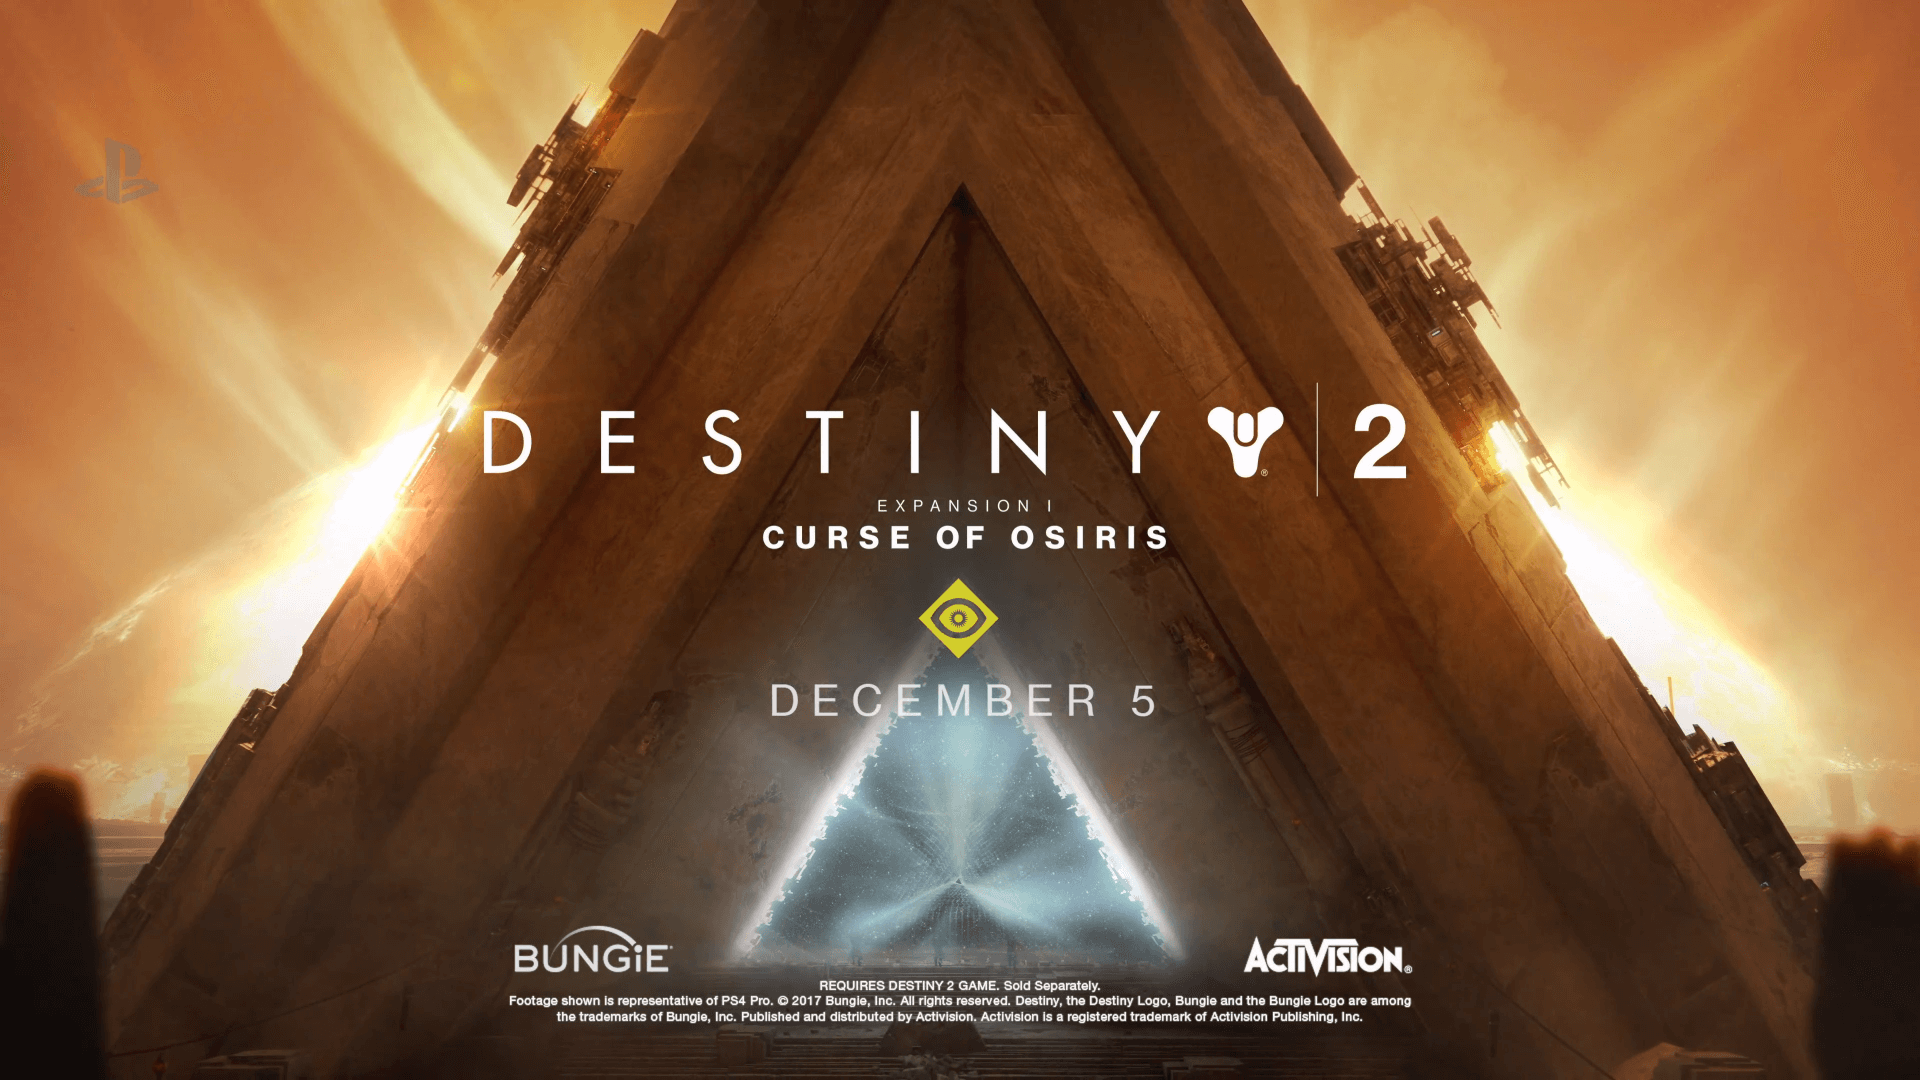 Destiny 2 Update 1 1 0 Is Now Live, Adds Curse of Osiris DLC